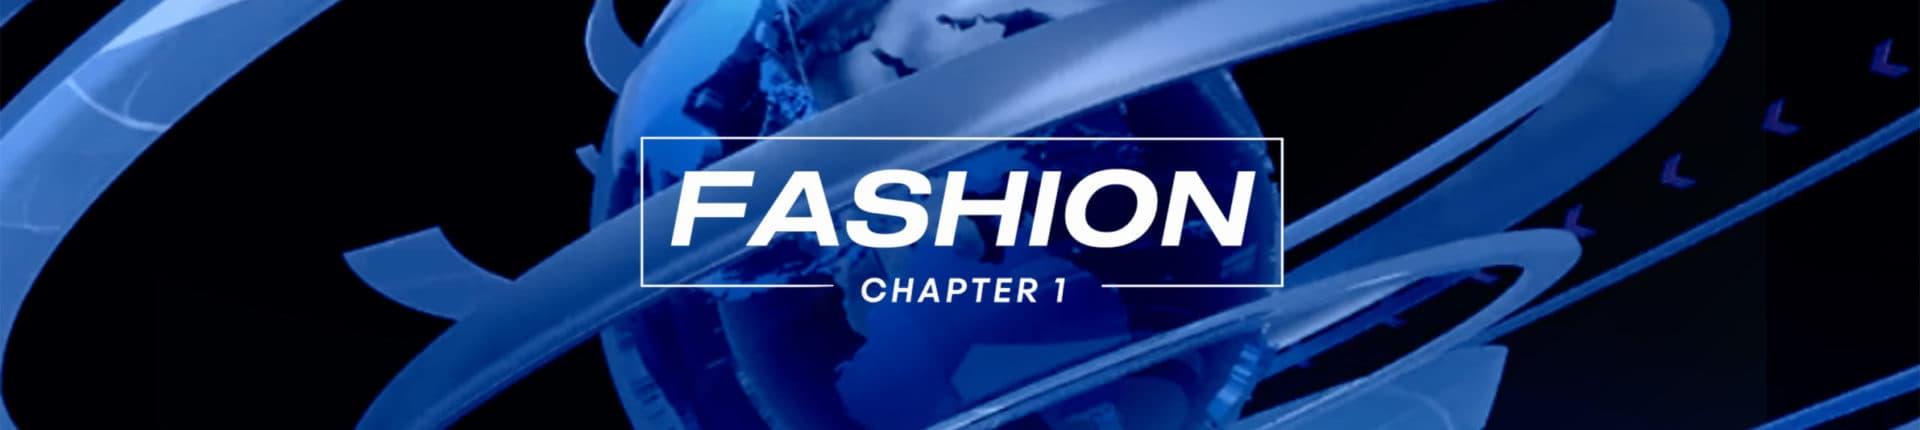 nightingale-tv-chapter1-fashion-FW20-trends-video-livestream-jack-jones.jpg